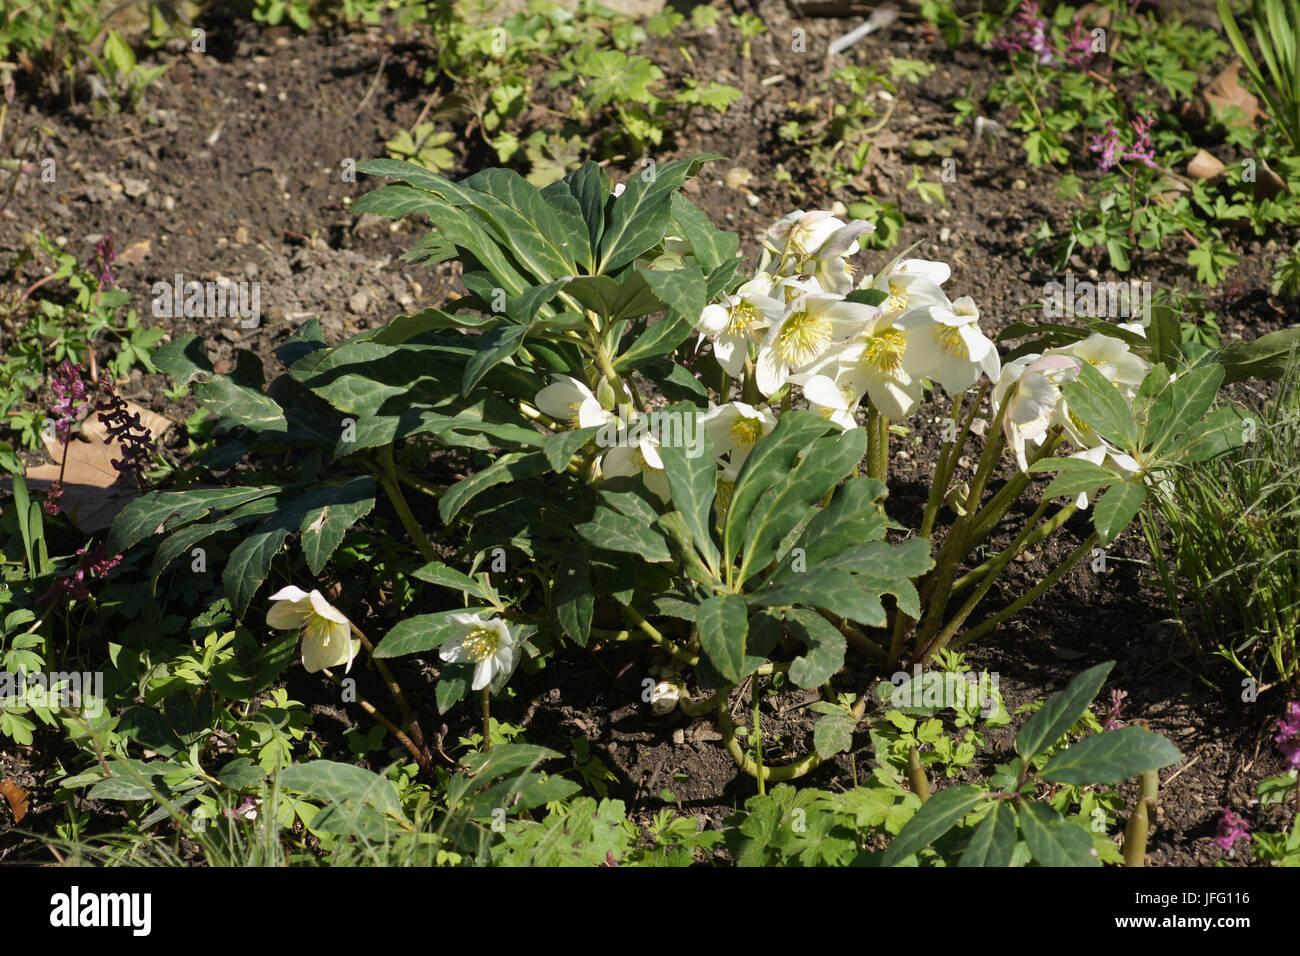 Helleborus niger, Hellebore - Stock Image